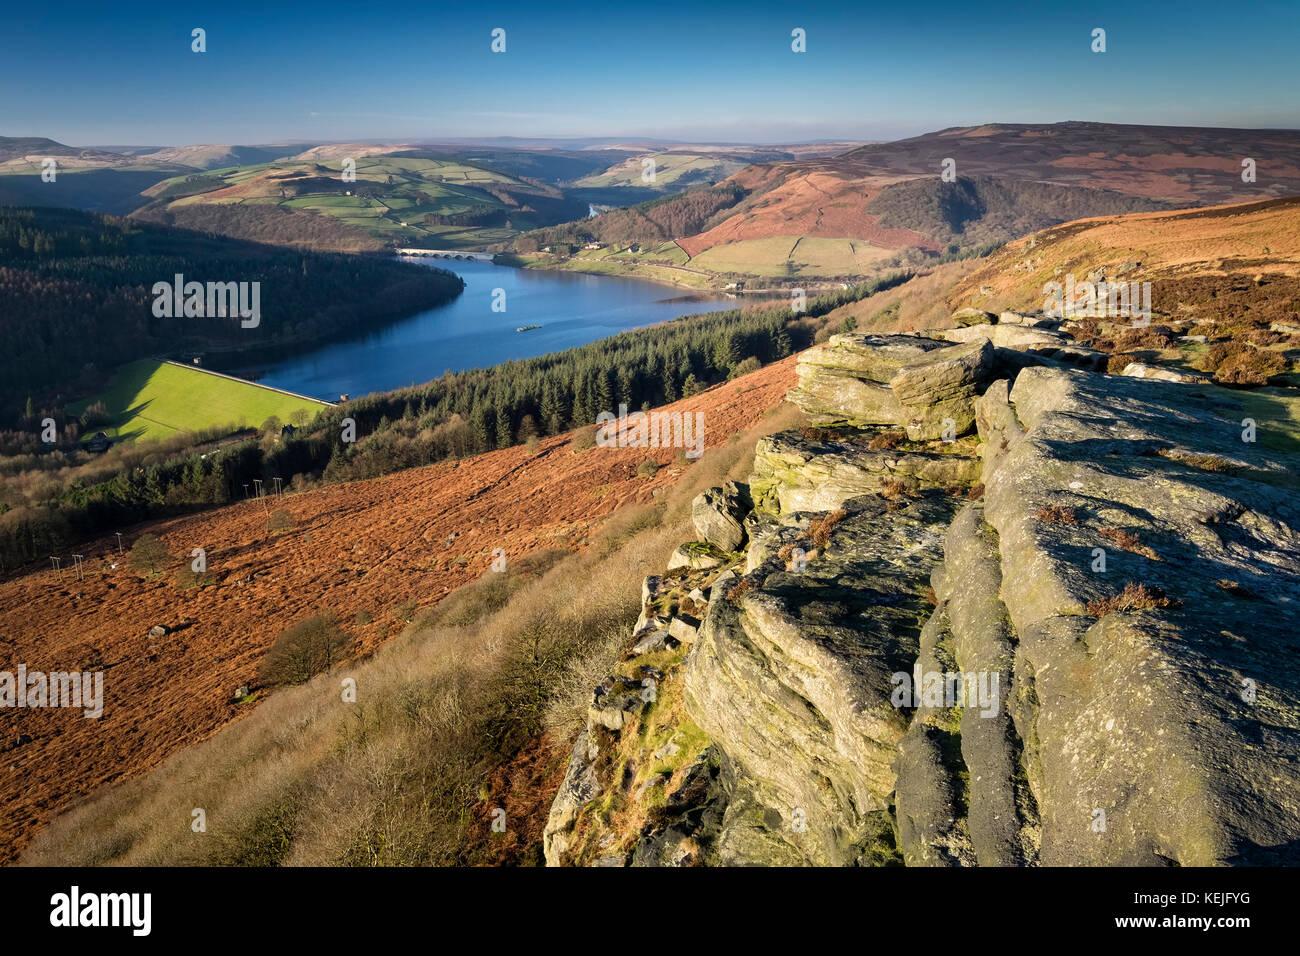 Ladybower Reservoir from Bamford Edge, Peak District National Park, Derbyshire, England, UK - Stock Image